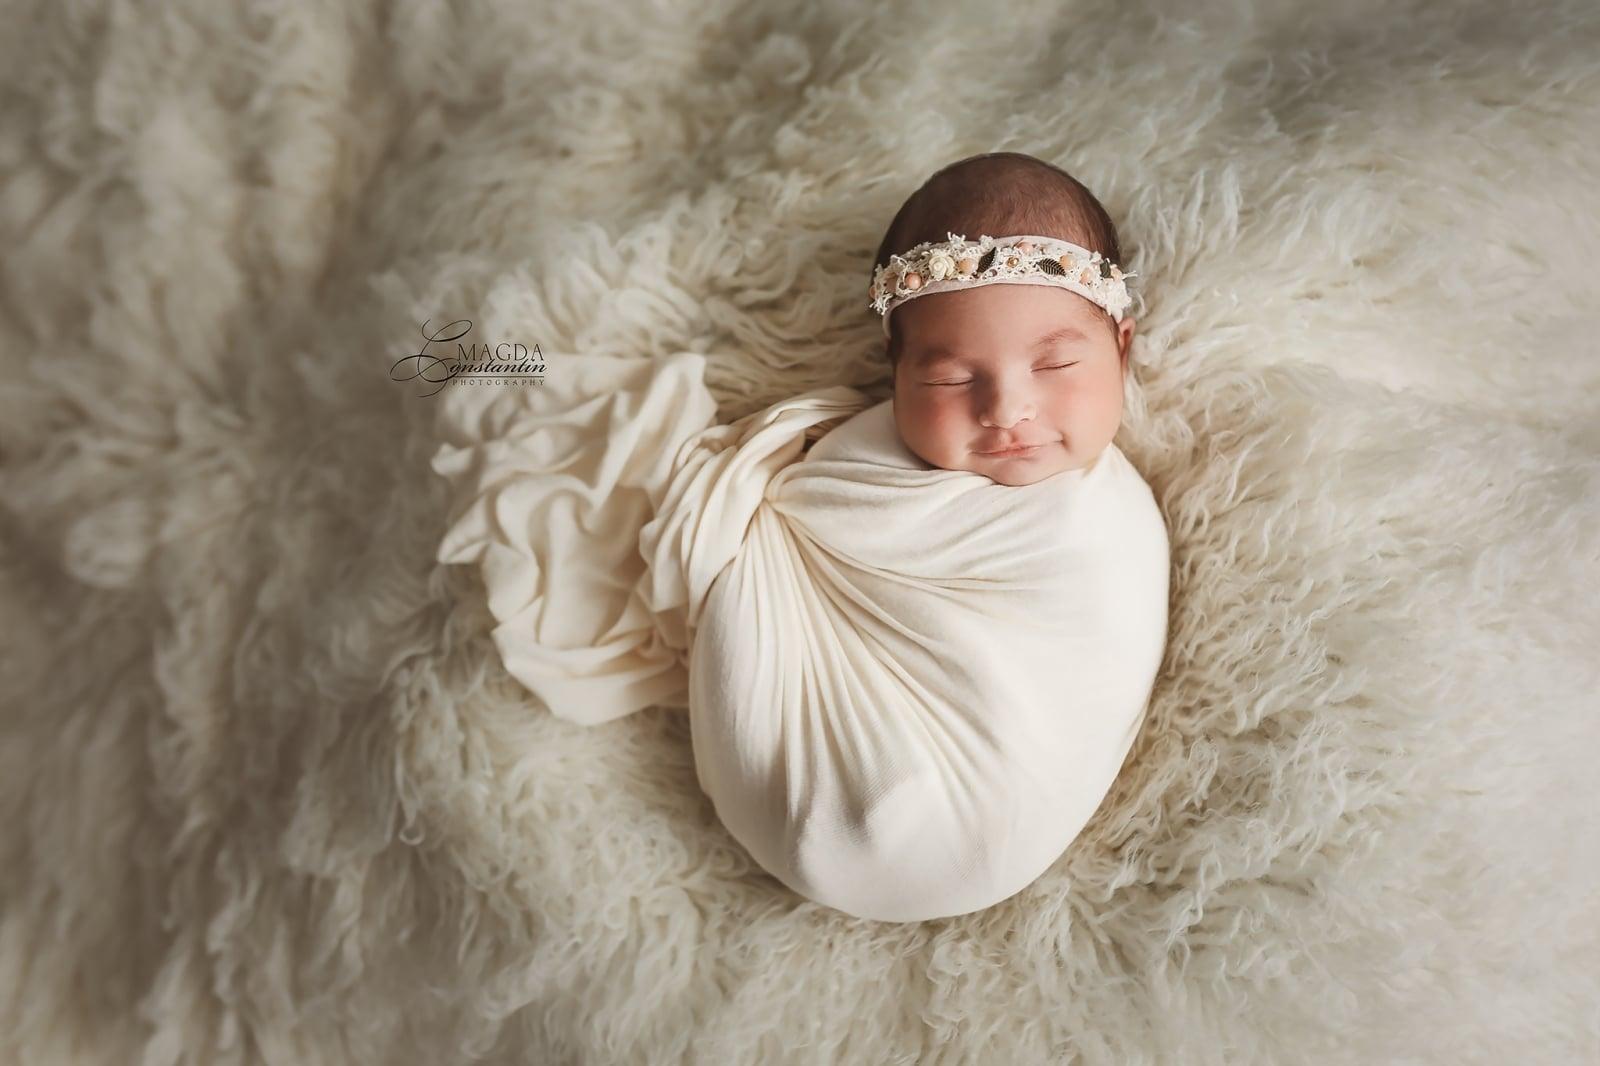 Sedinta foto nou-nascuti Bucuresti si zonele limitrofe